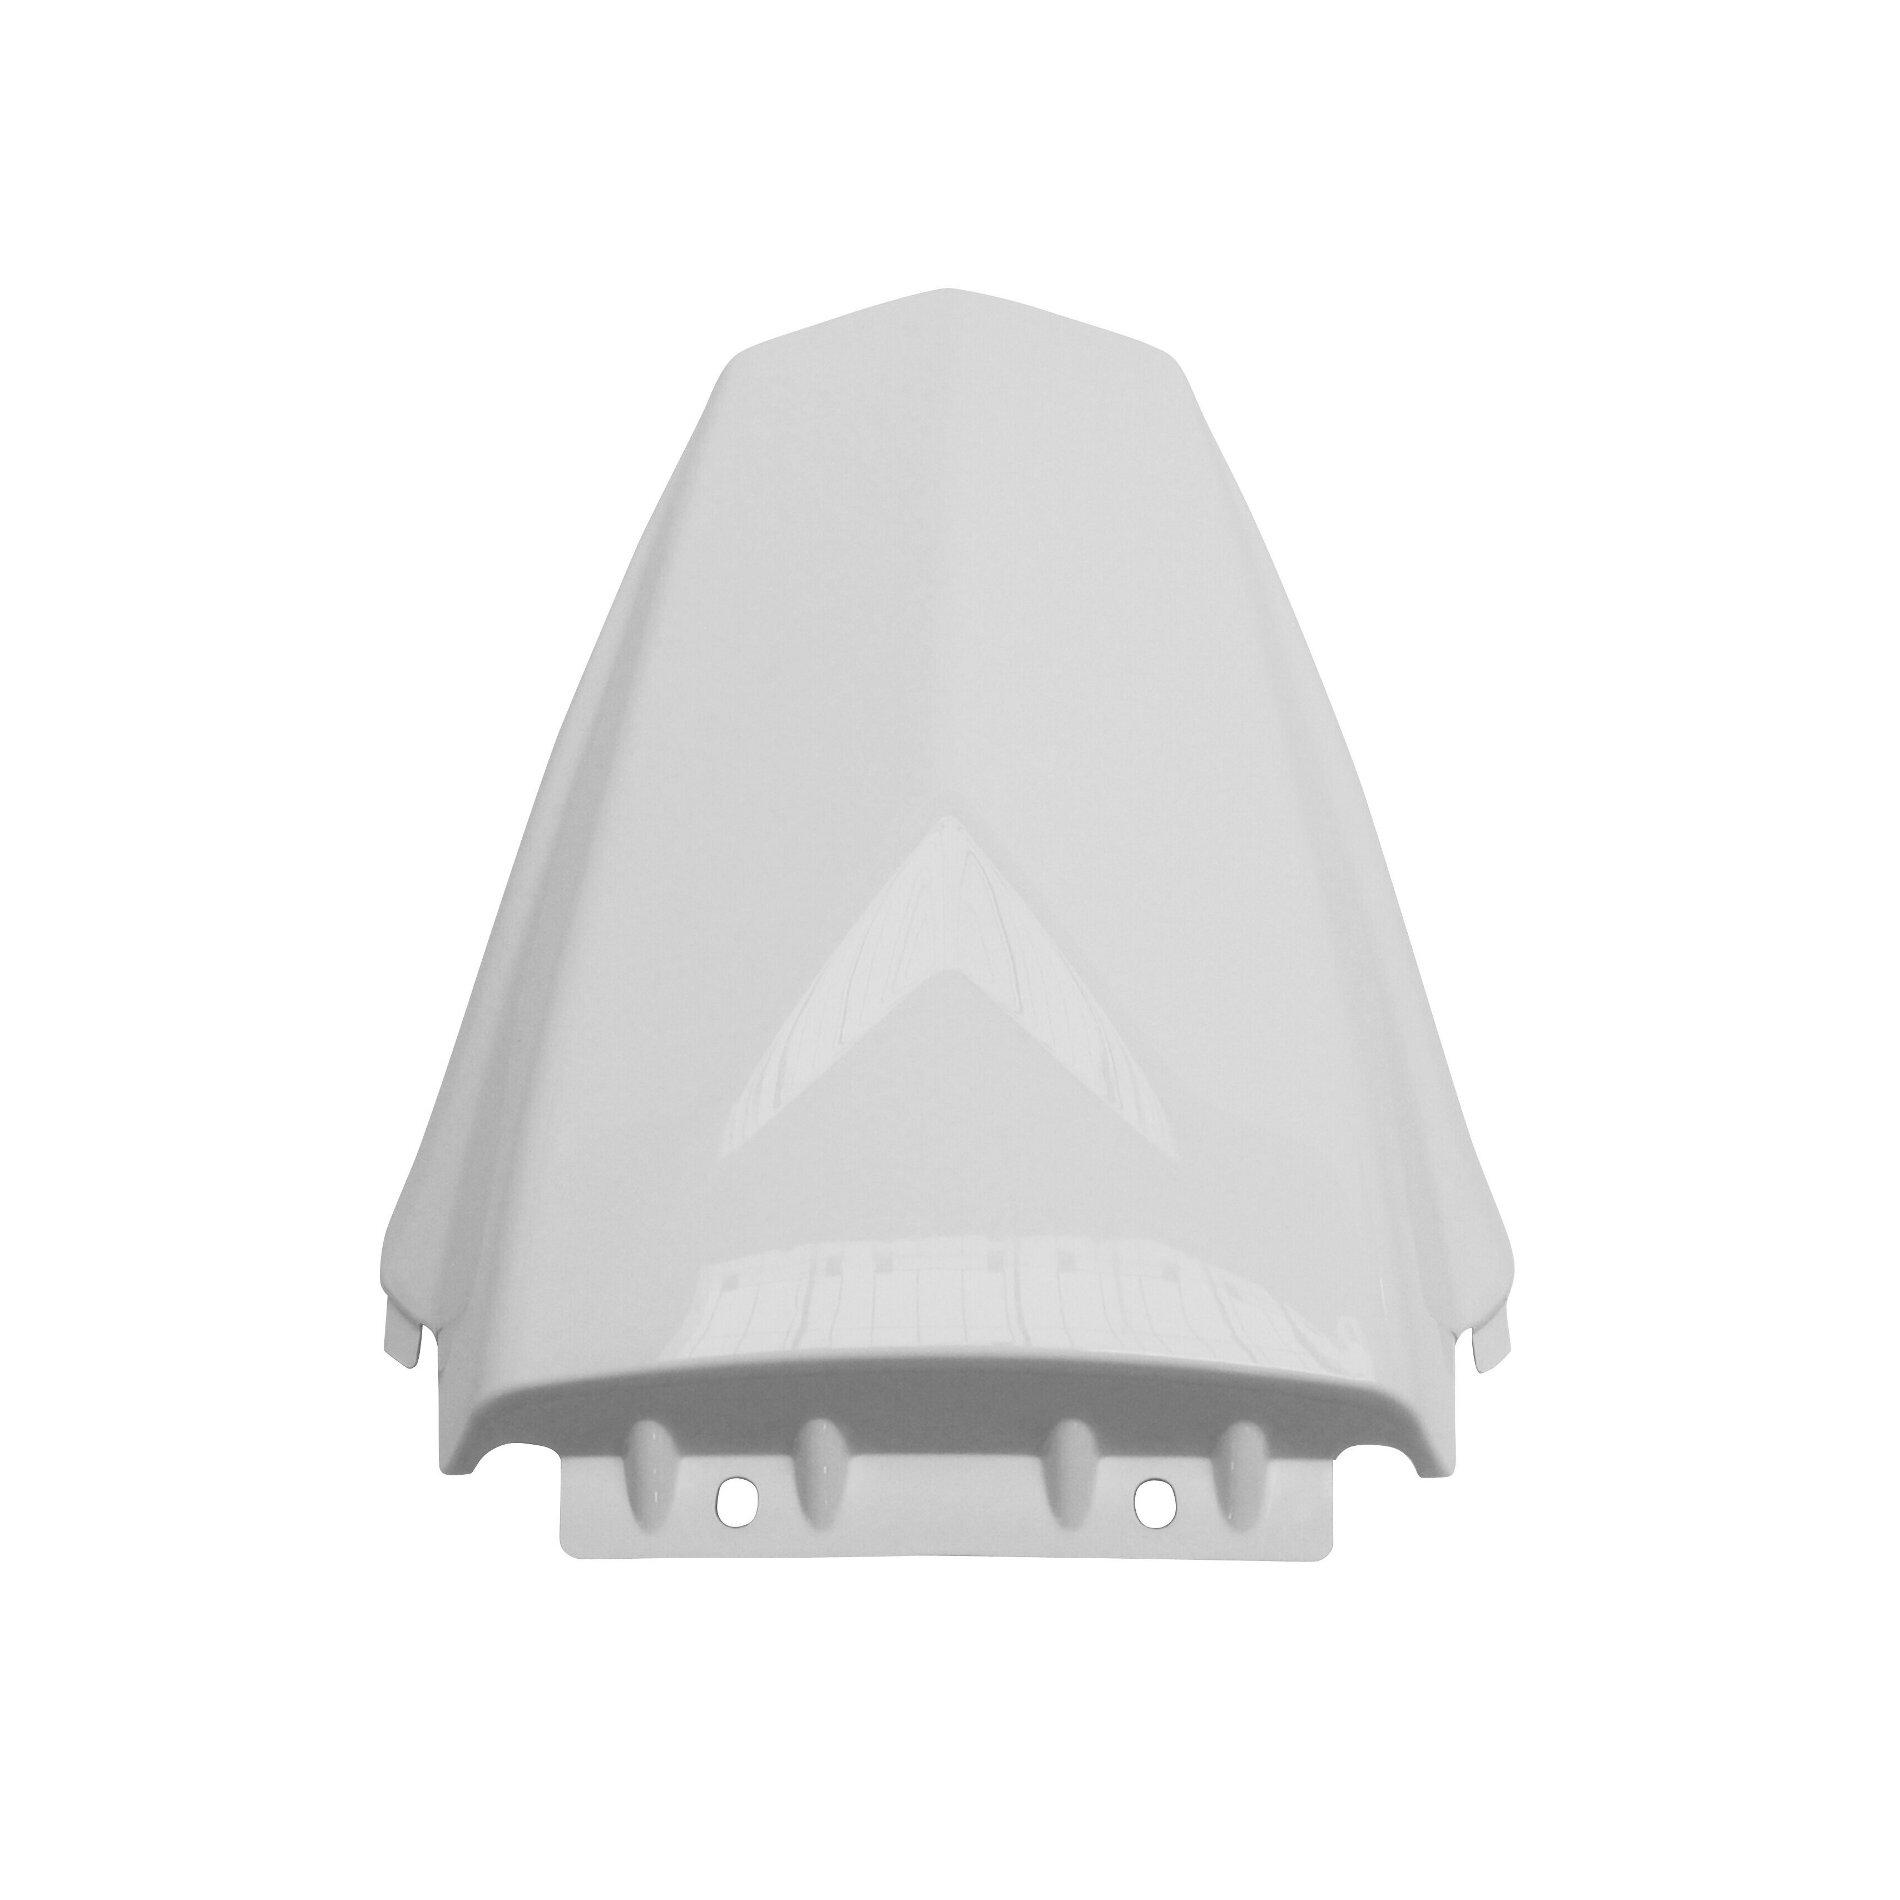 Garde boue arrière blanc brillant adaptable derbi senda drd x-treme/x-